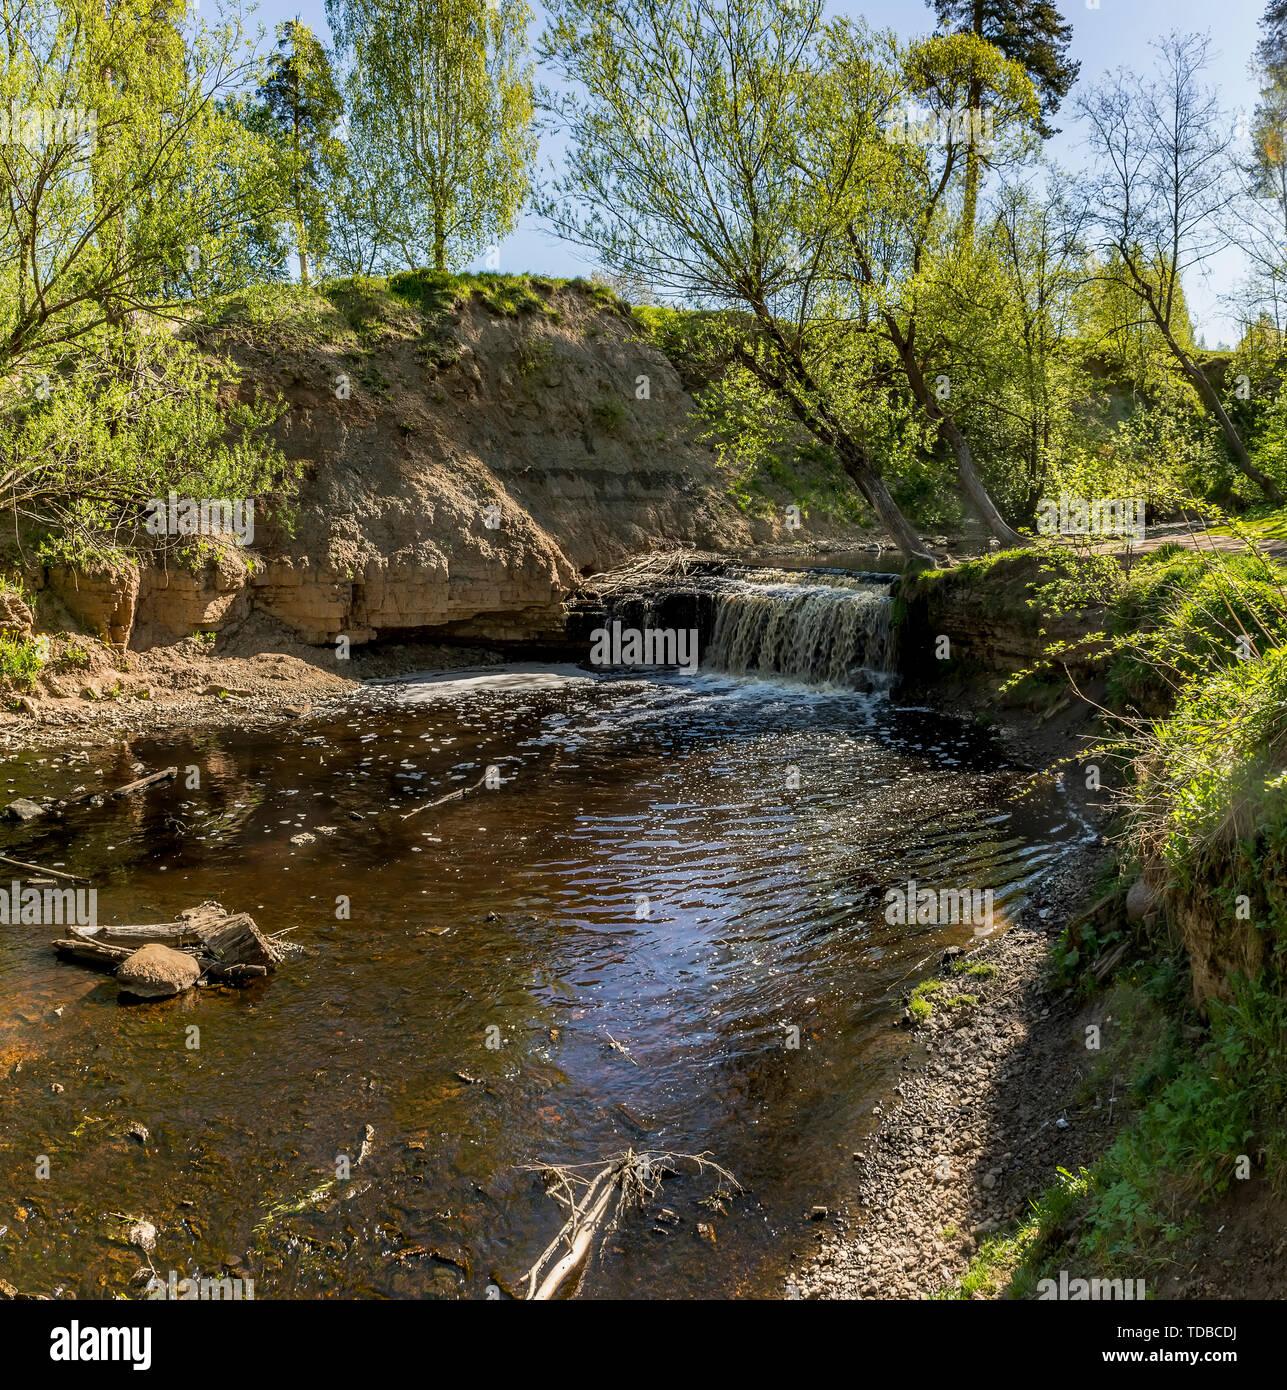 Wasserfall auf dem Fluss Sablinka im Dorf von Uljanowsk, Leningrad Region. Stockbild